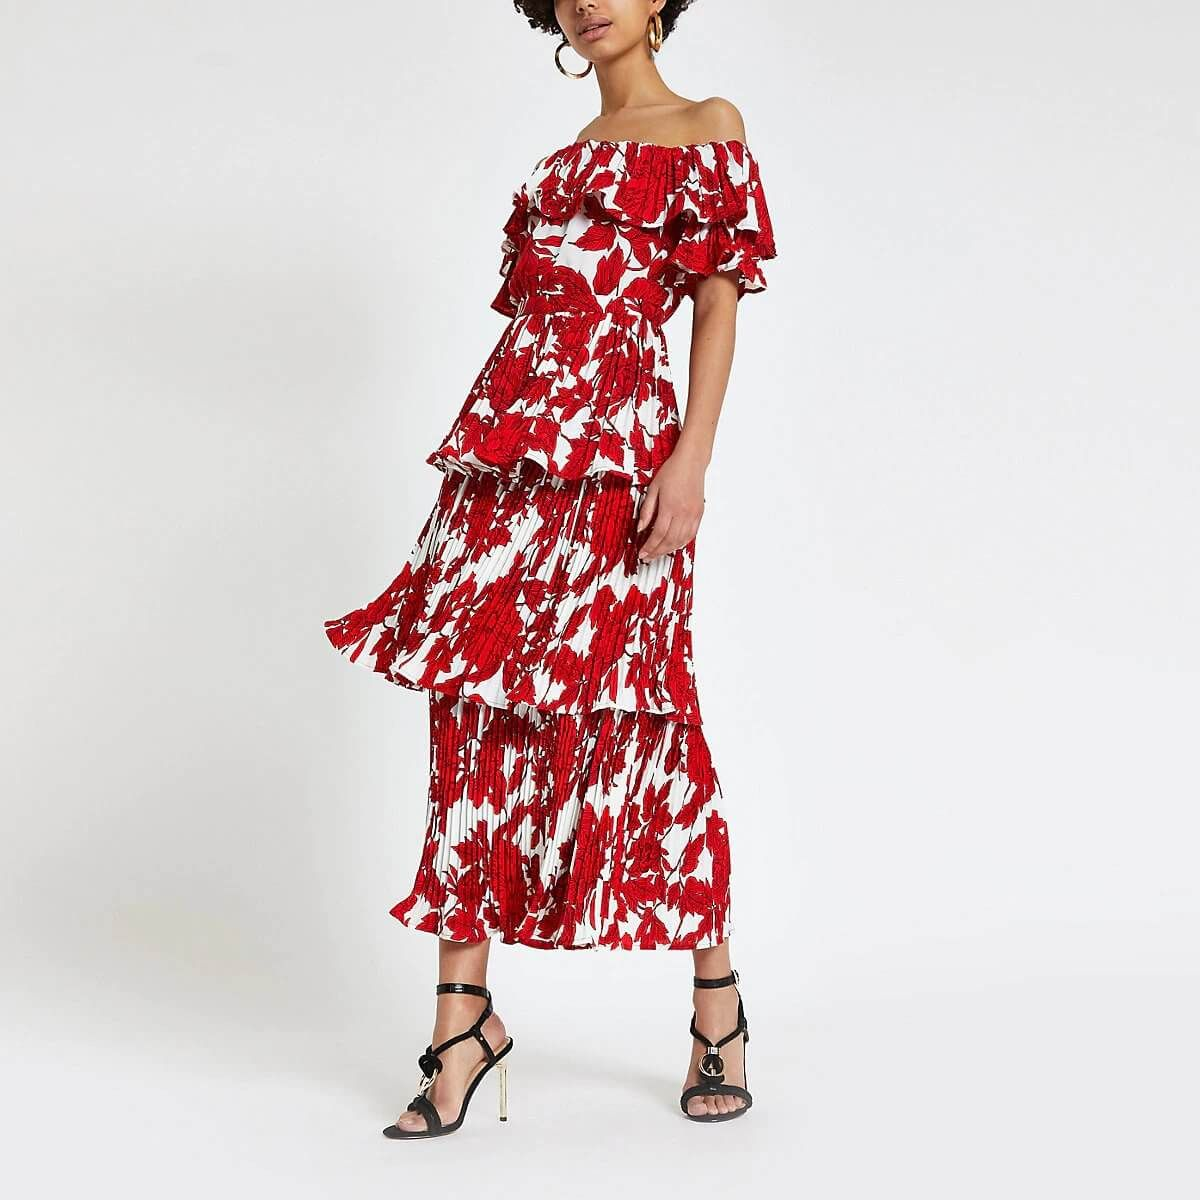 Best Options For Dresses To Wear On Wedding Fashionterest Dresses To Wear To A Wedding Bardot Midi Dress Midi Dress [ 1200 x 1200 Pixel ]